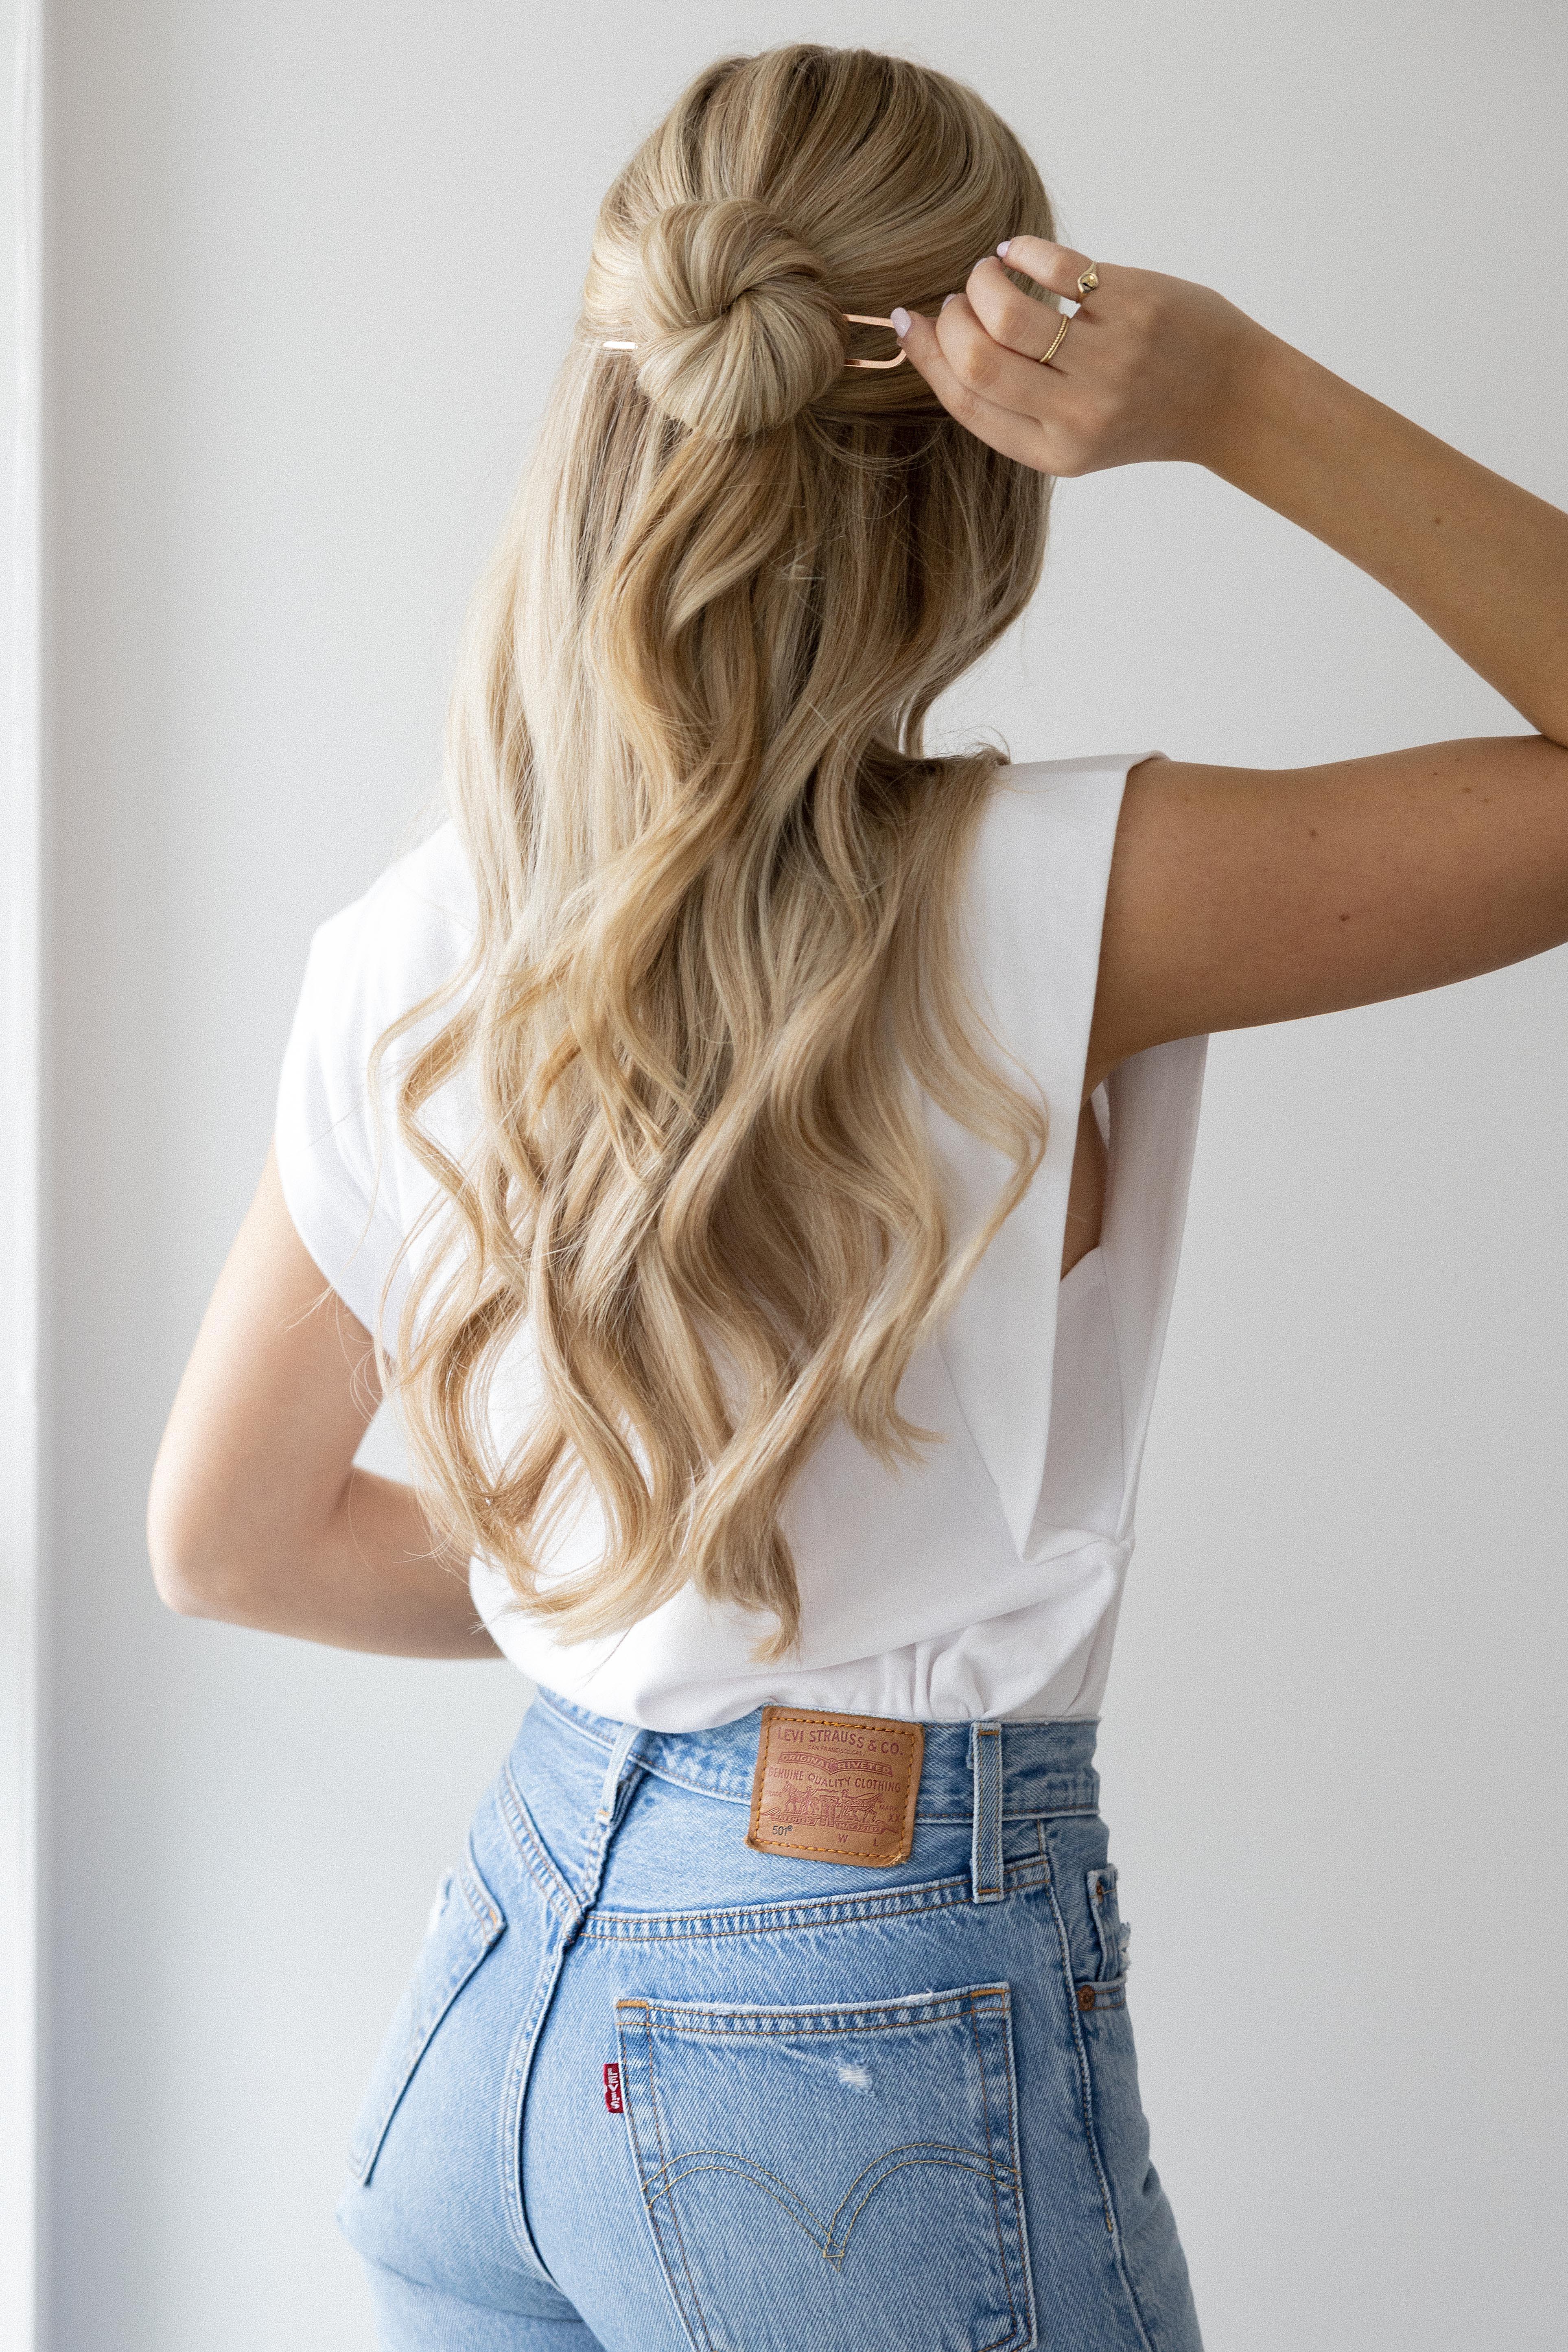 Kristin Ess FRENCH PIN Hair Tutorial | www.alexgaboury.com